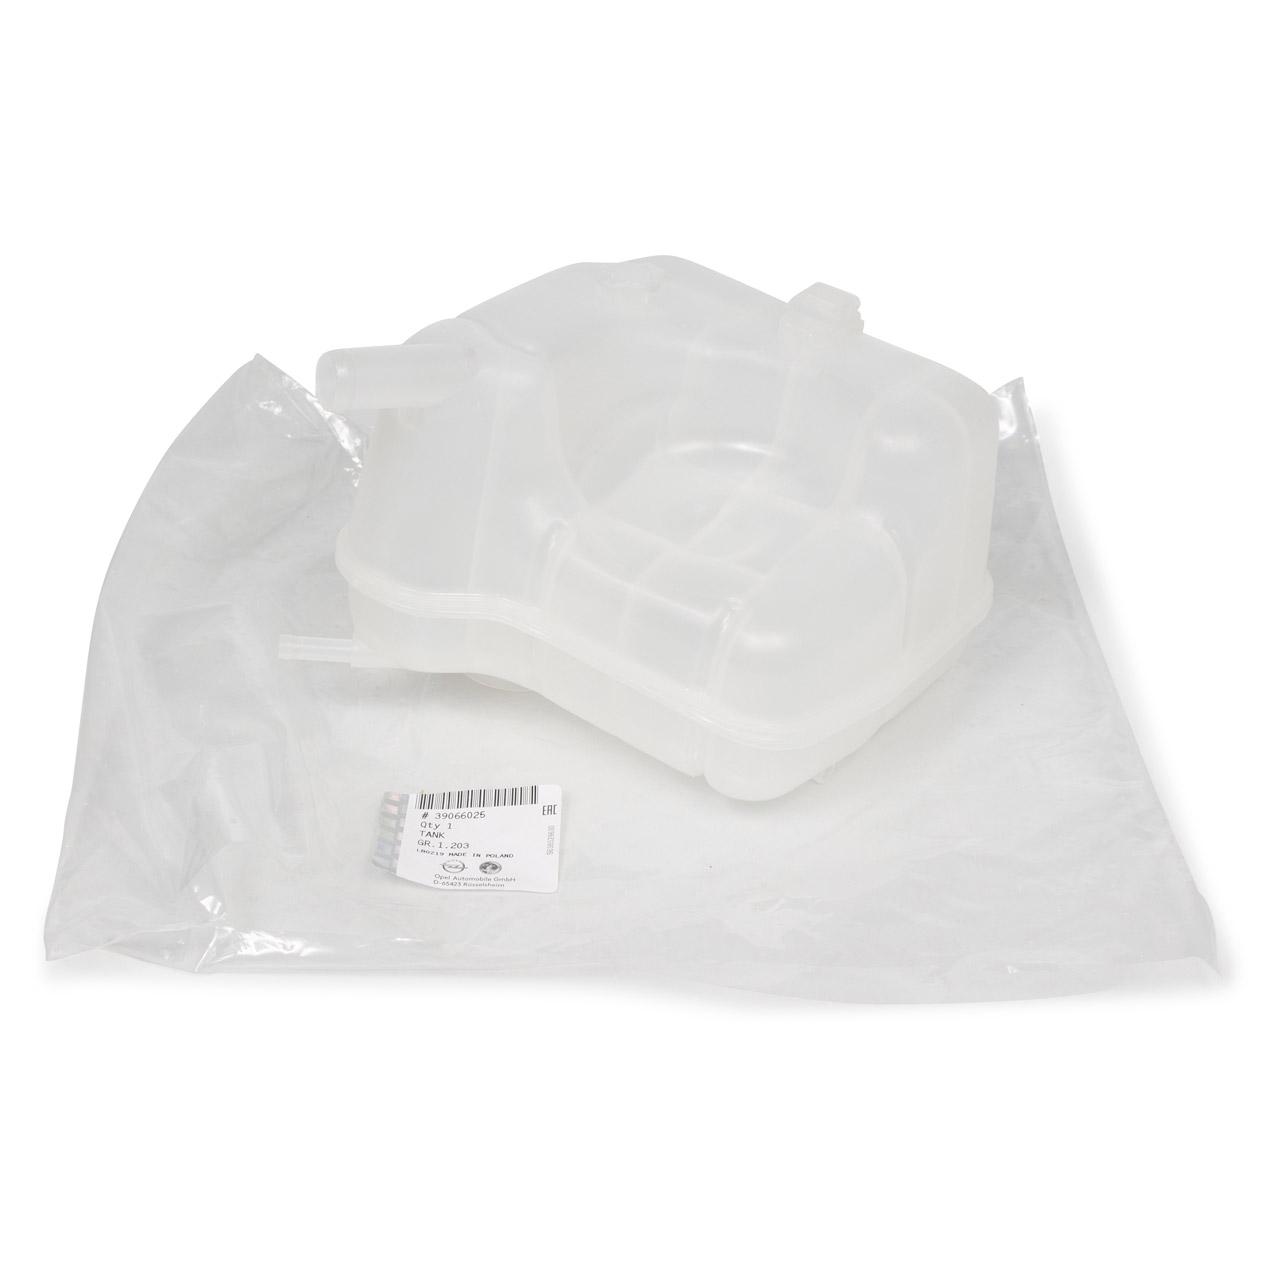 ORIGINAL Opel Ausgleichsbehälter Kühlmittelbehälter INSIGNIA A (G09) 39066025